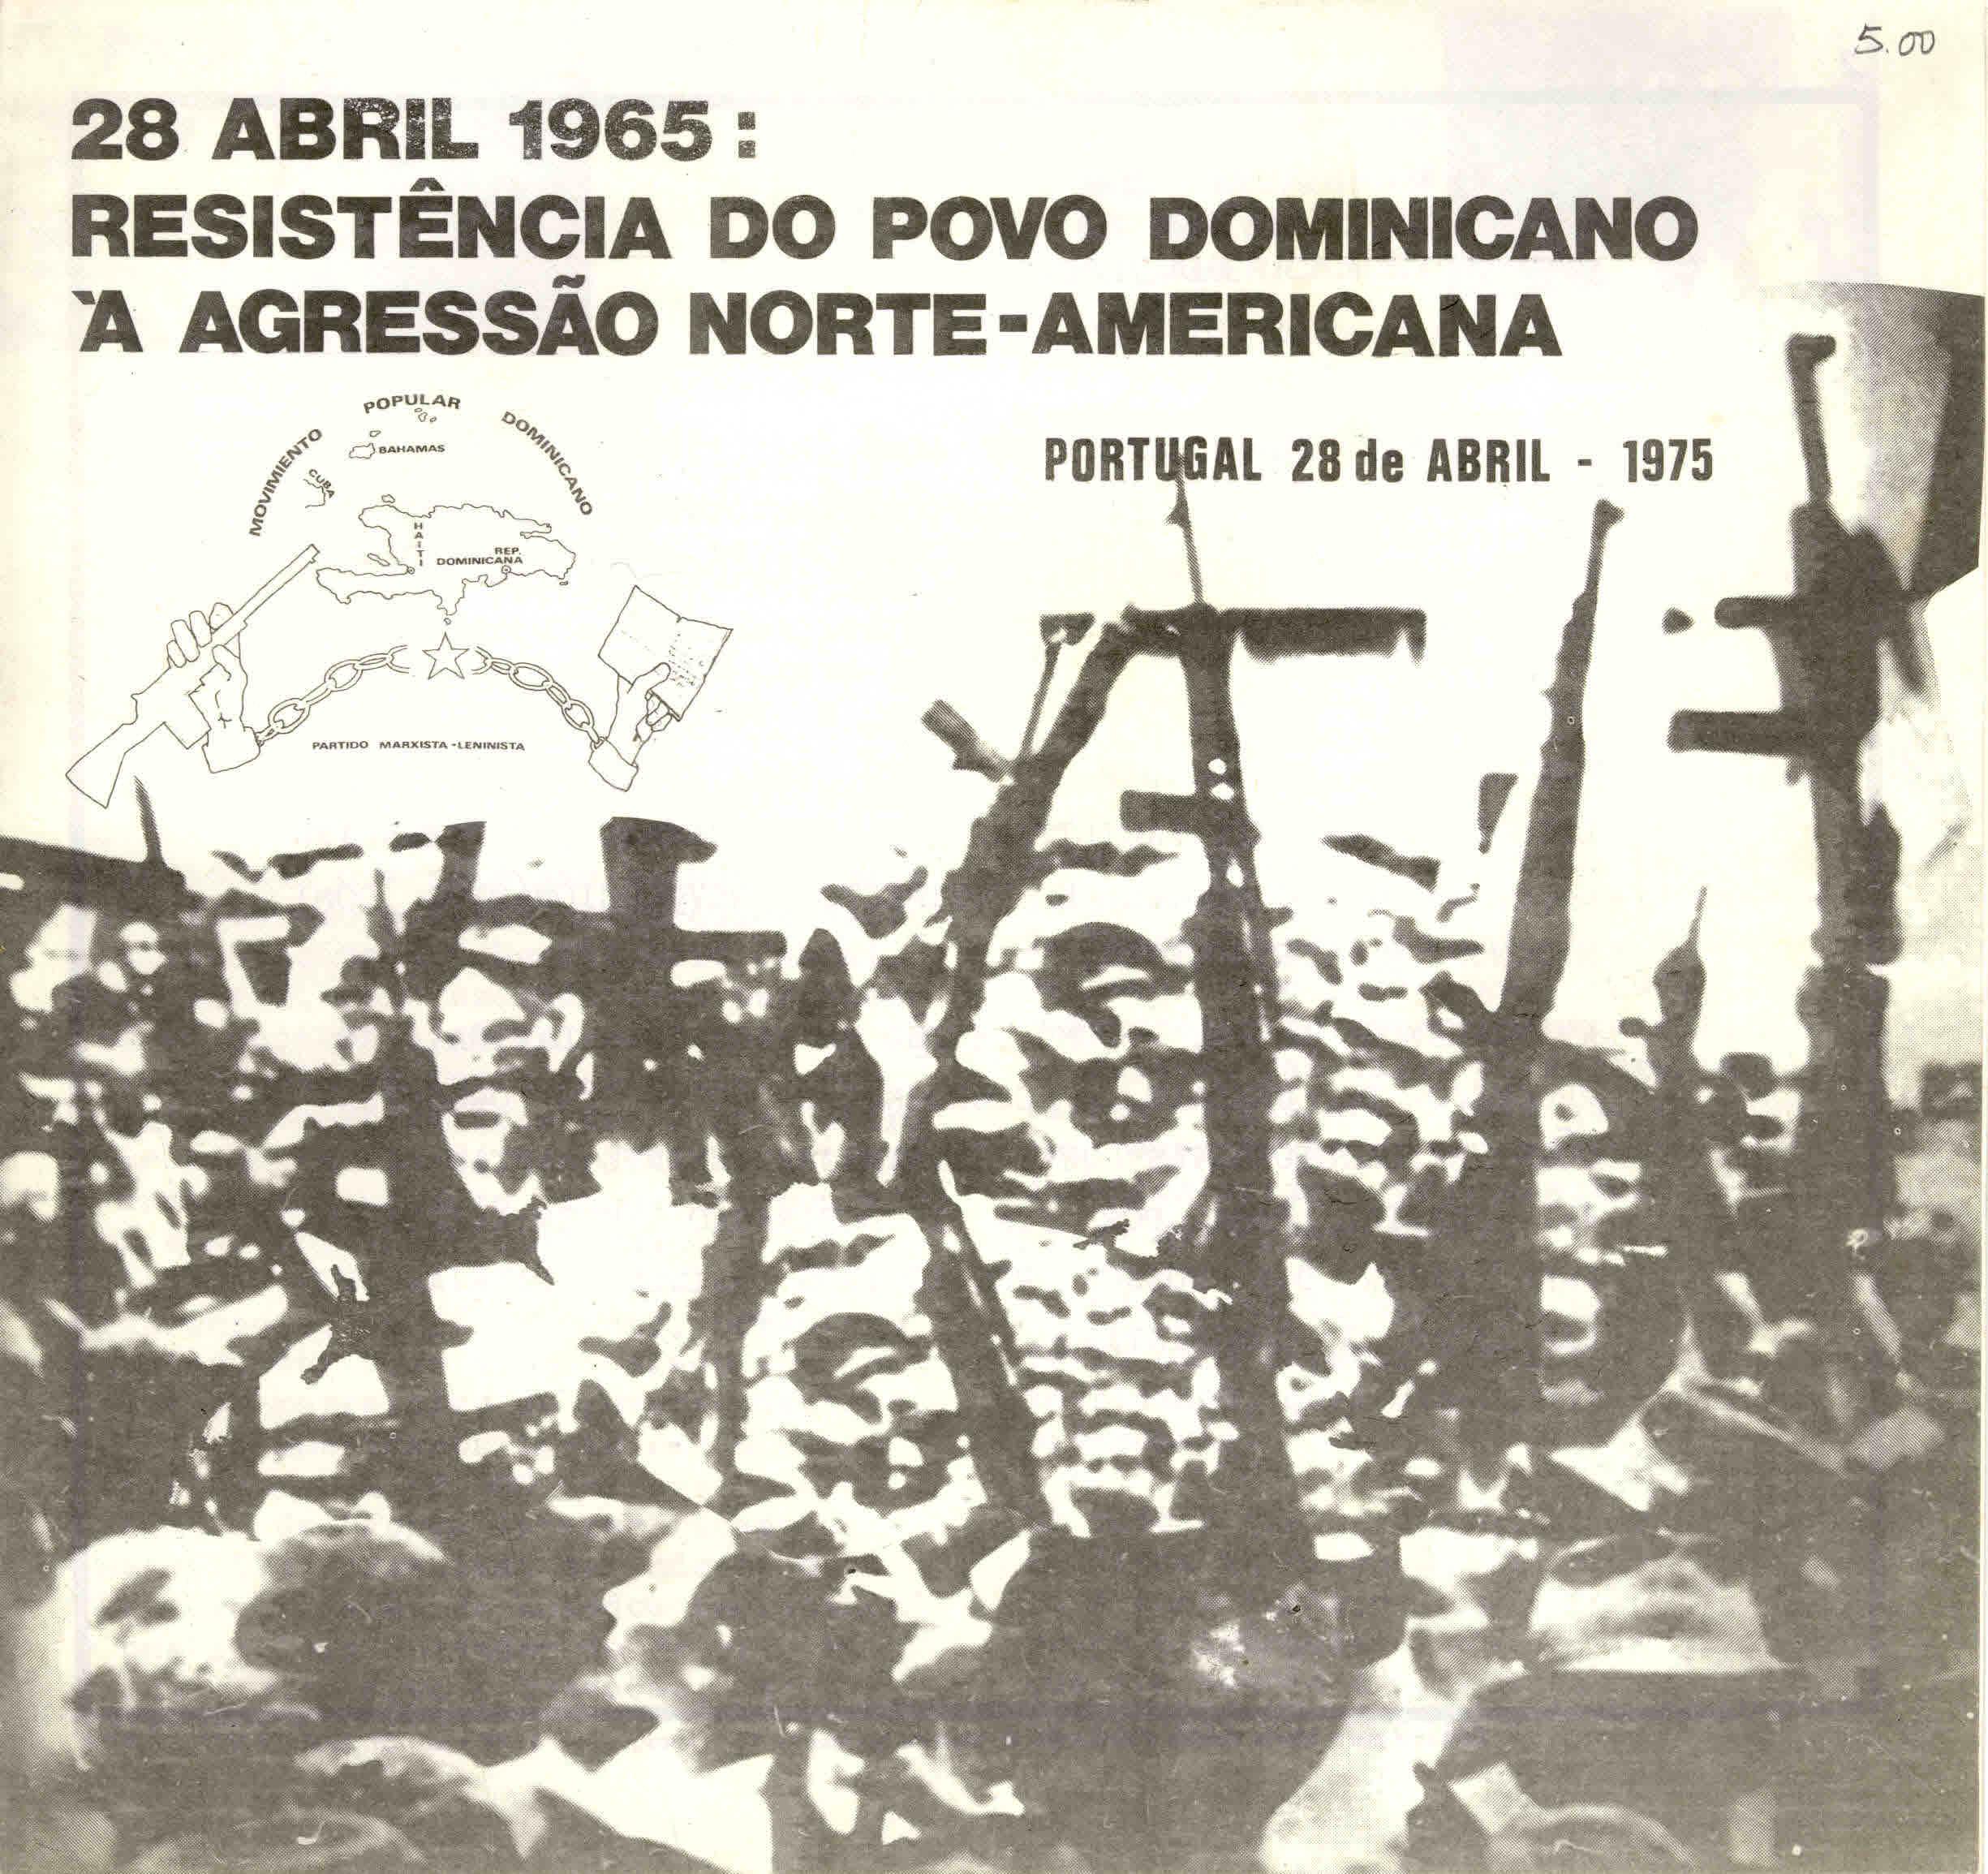 Copy of 28 de Abril 1965